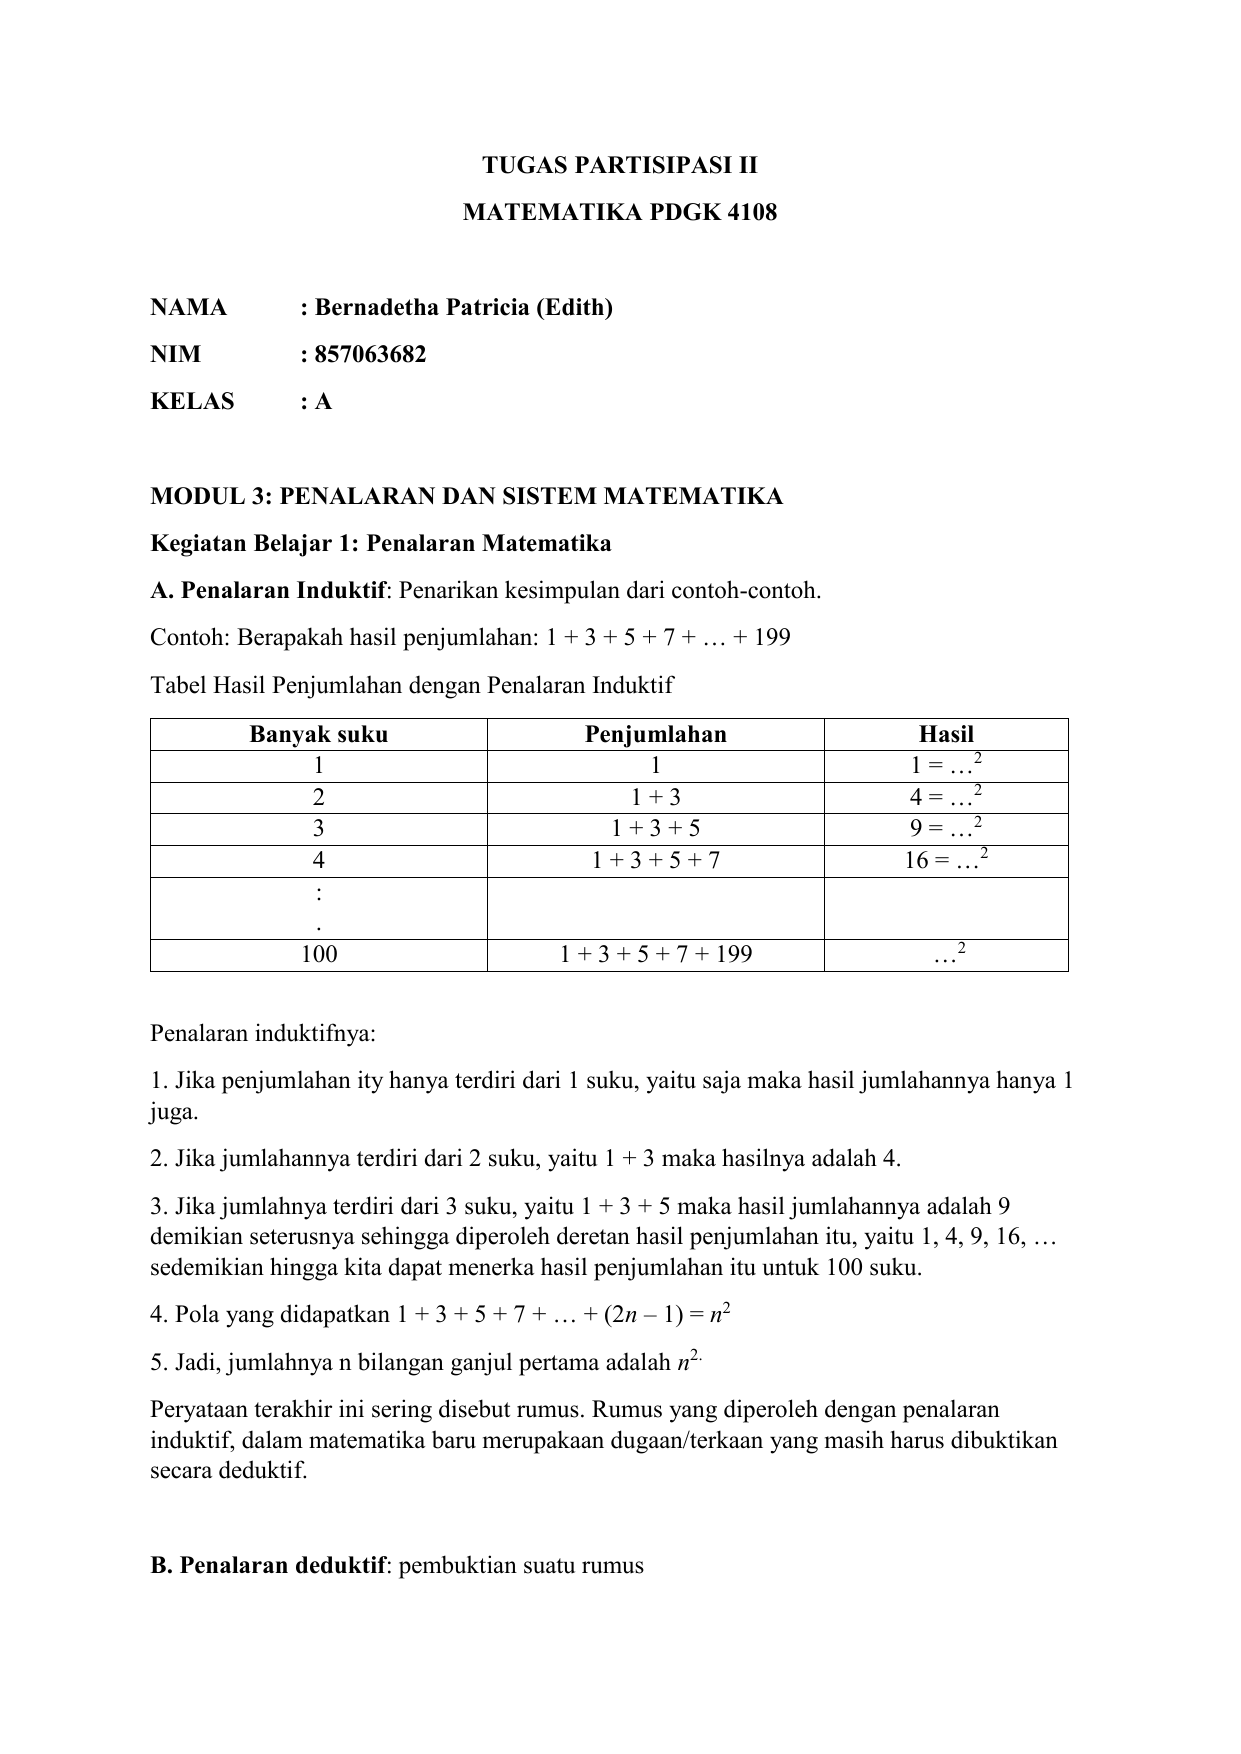 Tugas Partisipasi Ii Matematika Bernadetha 857063682 Kelas A